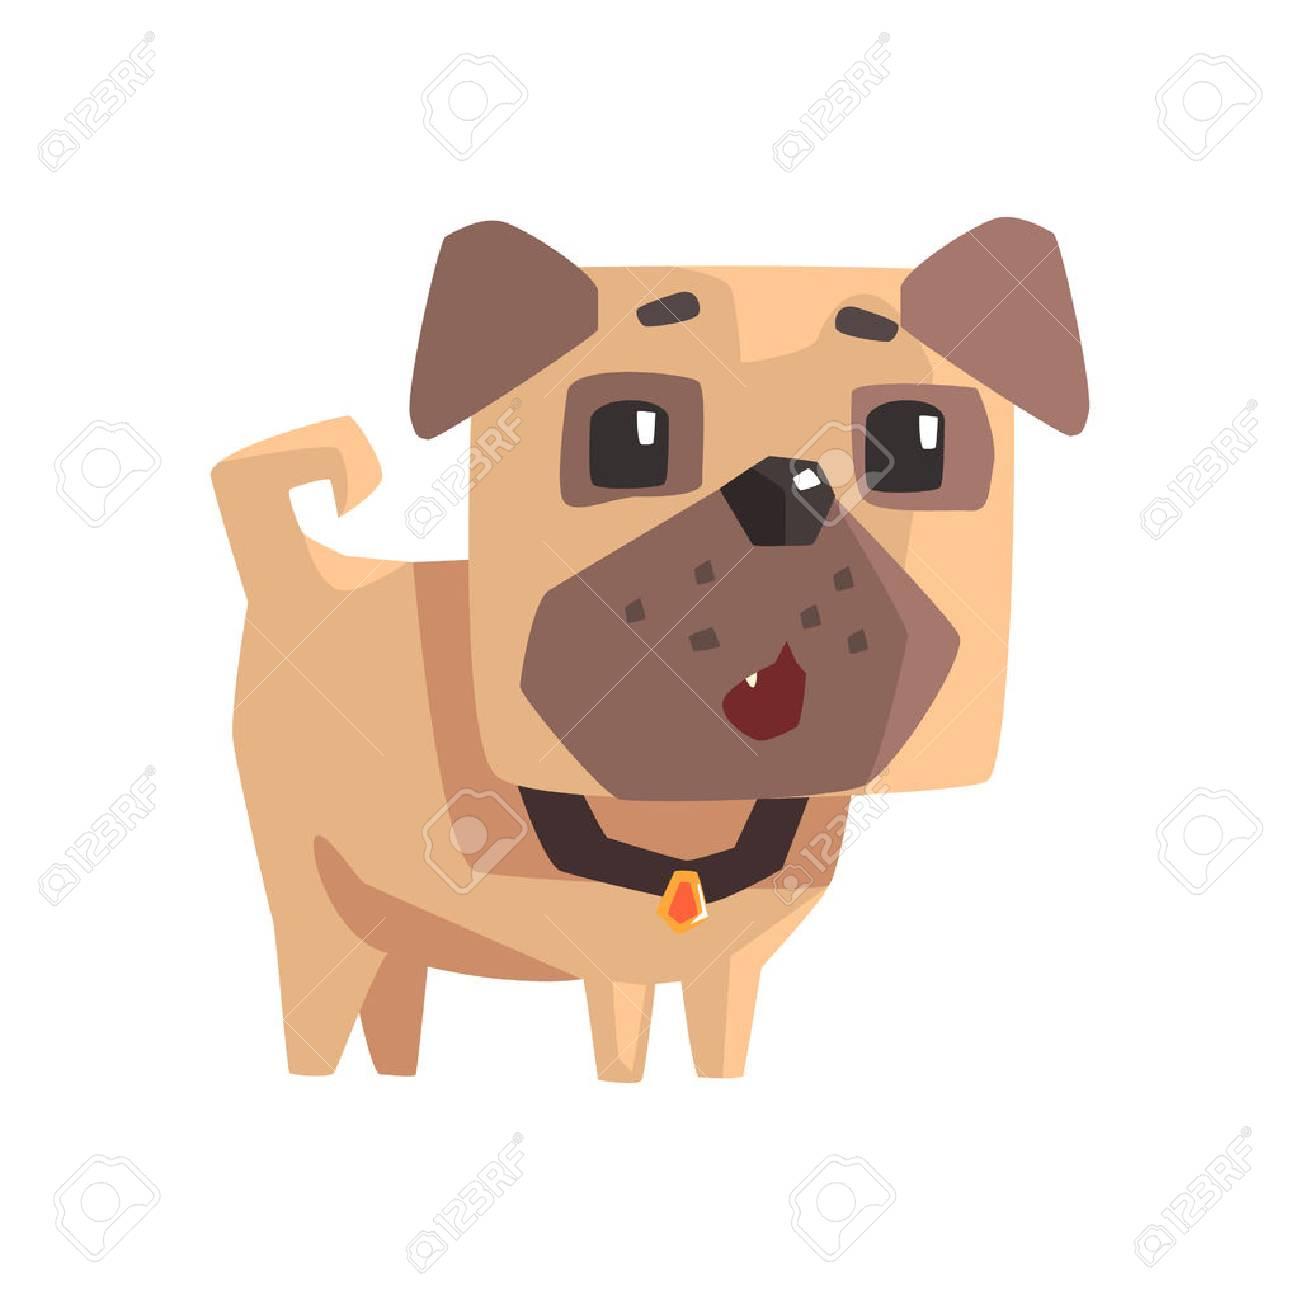 Astonished Little Pet Pug Dog Puppy With Collar Emoji Cartoon